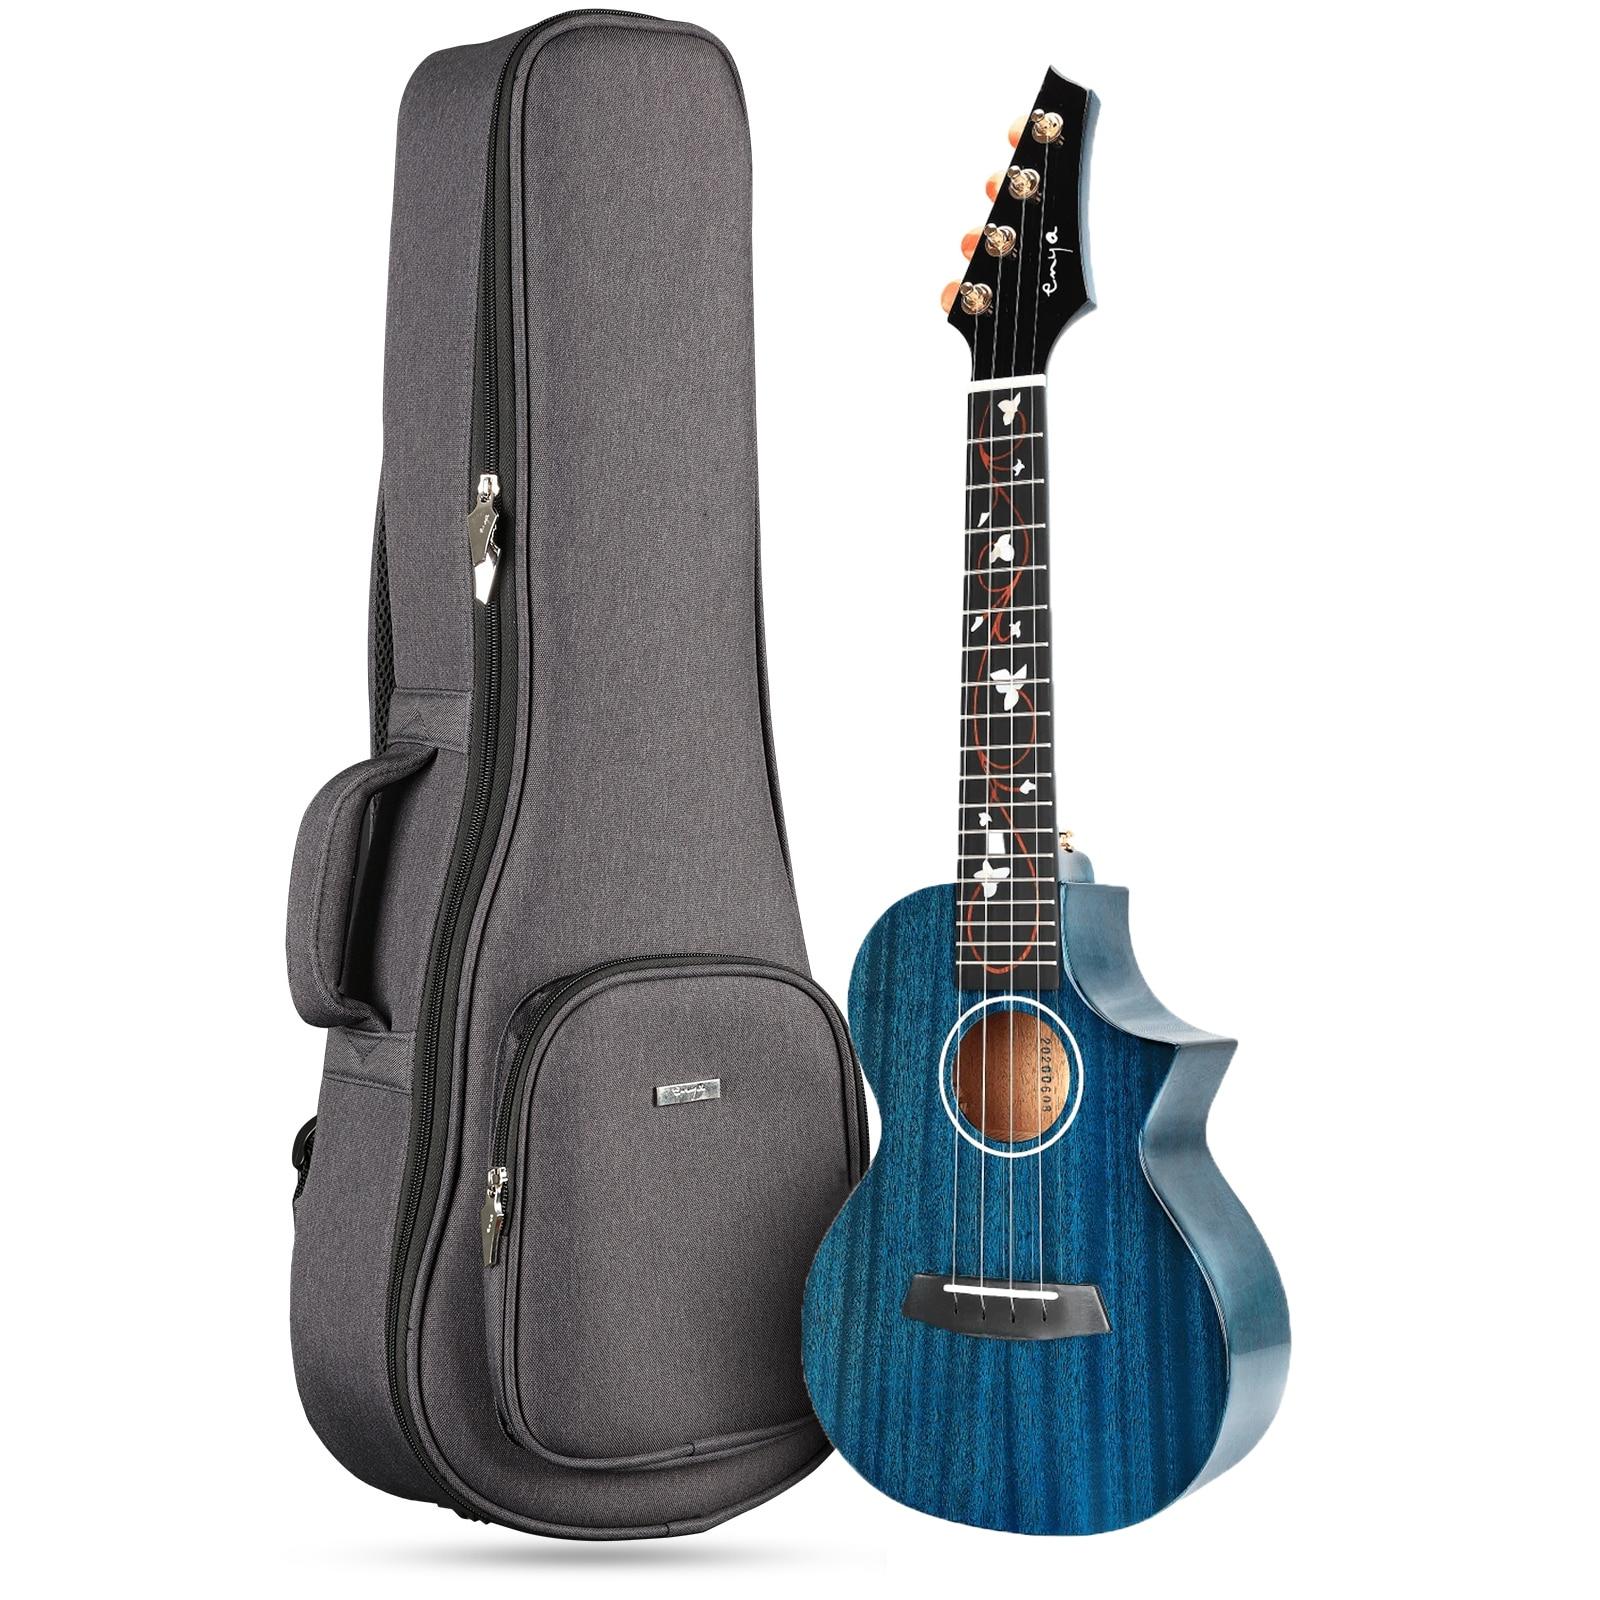 Enya Ukulele Concert Tenor M6 Ukelele High Gloss AAA Solid Mahogany Acoustic String Instruments Hawaii Mini Guitar with Pickup